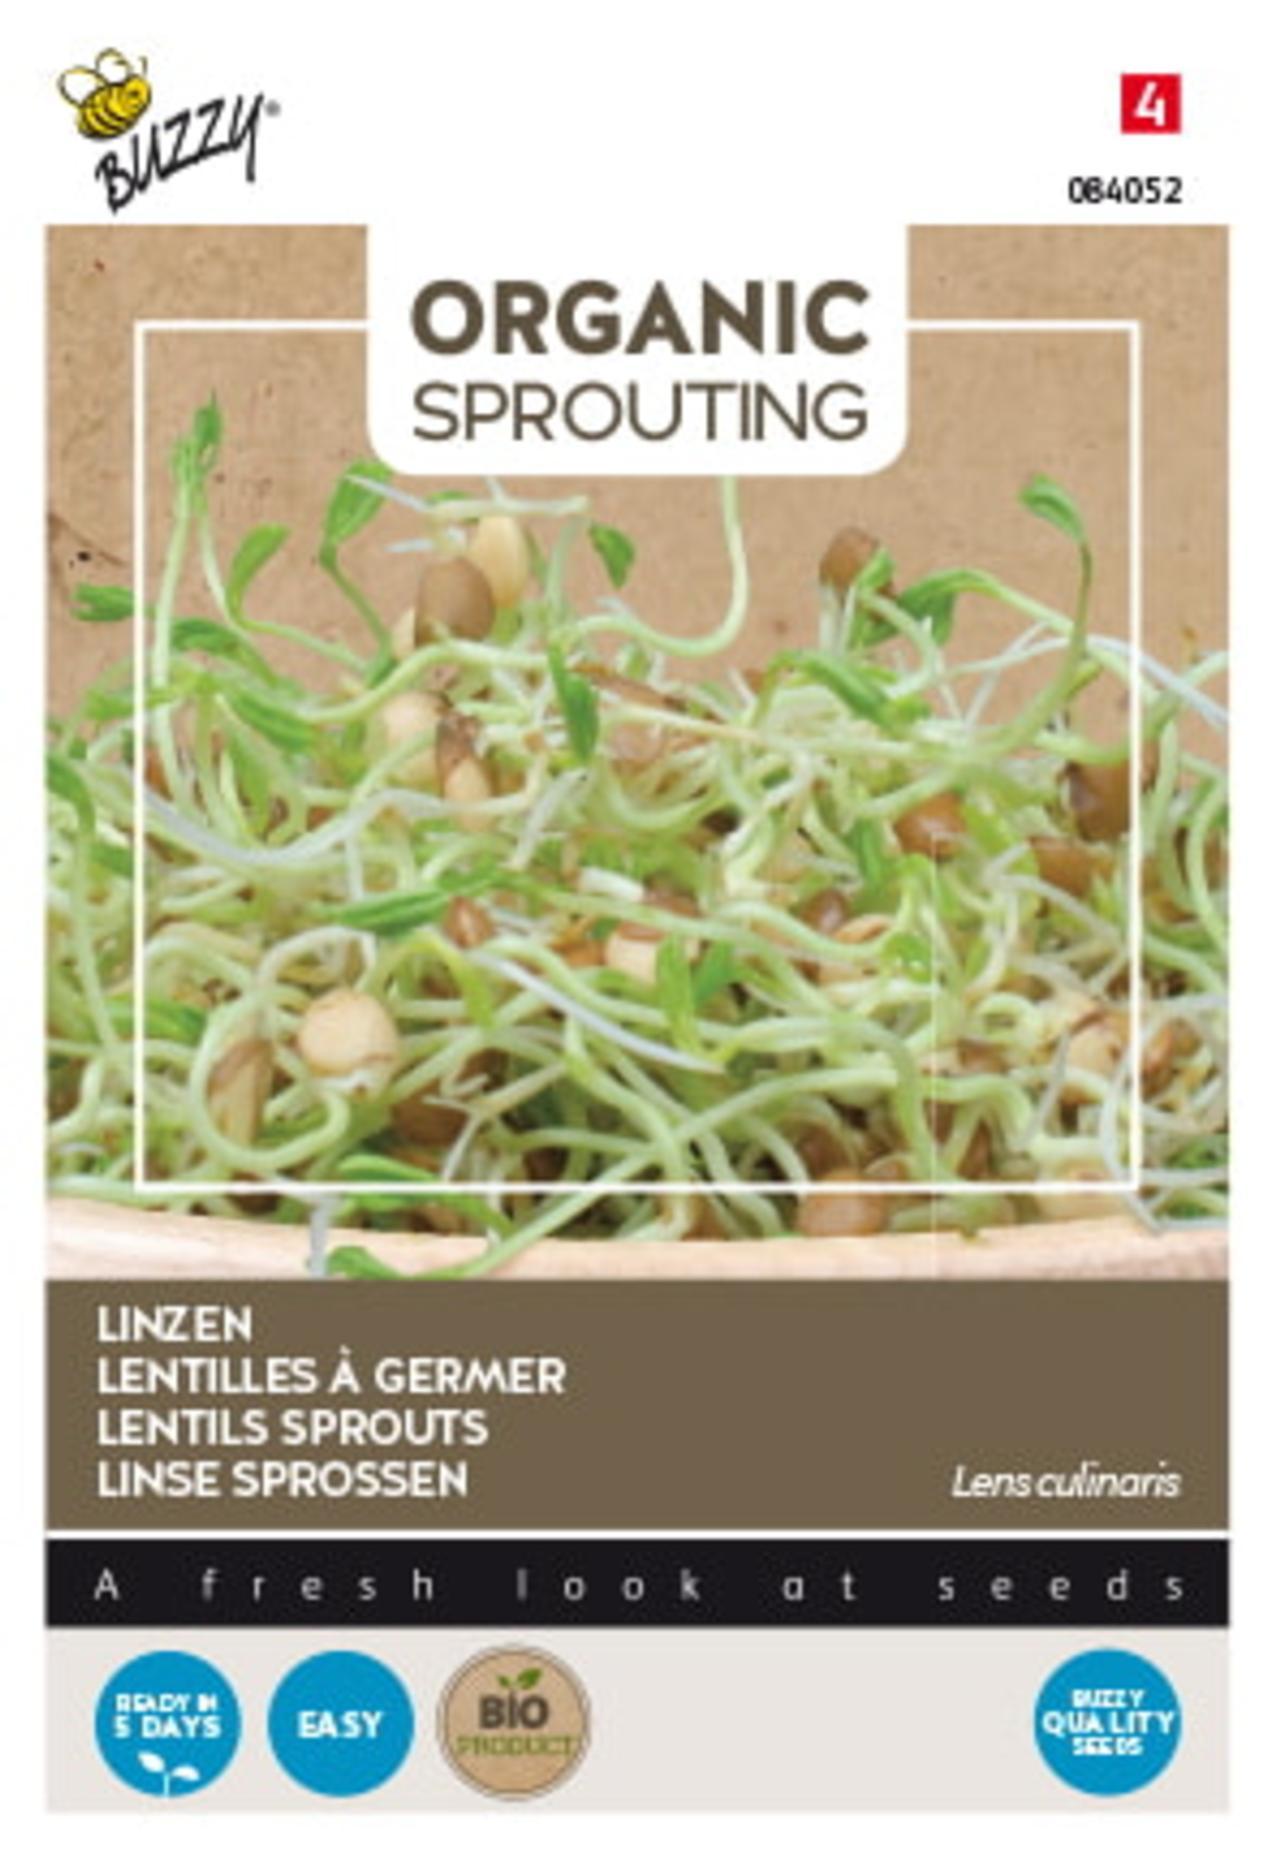 Lens culinaris  (BIO) plant